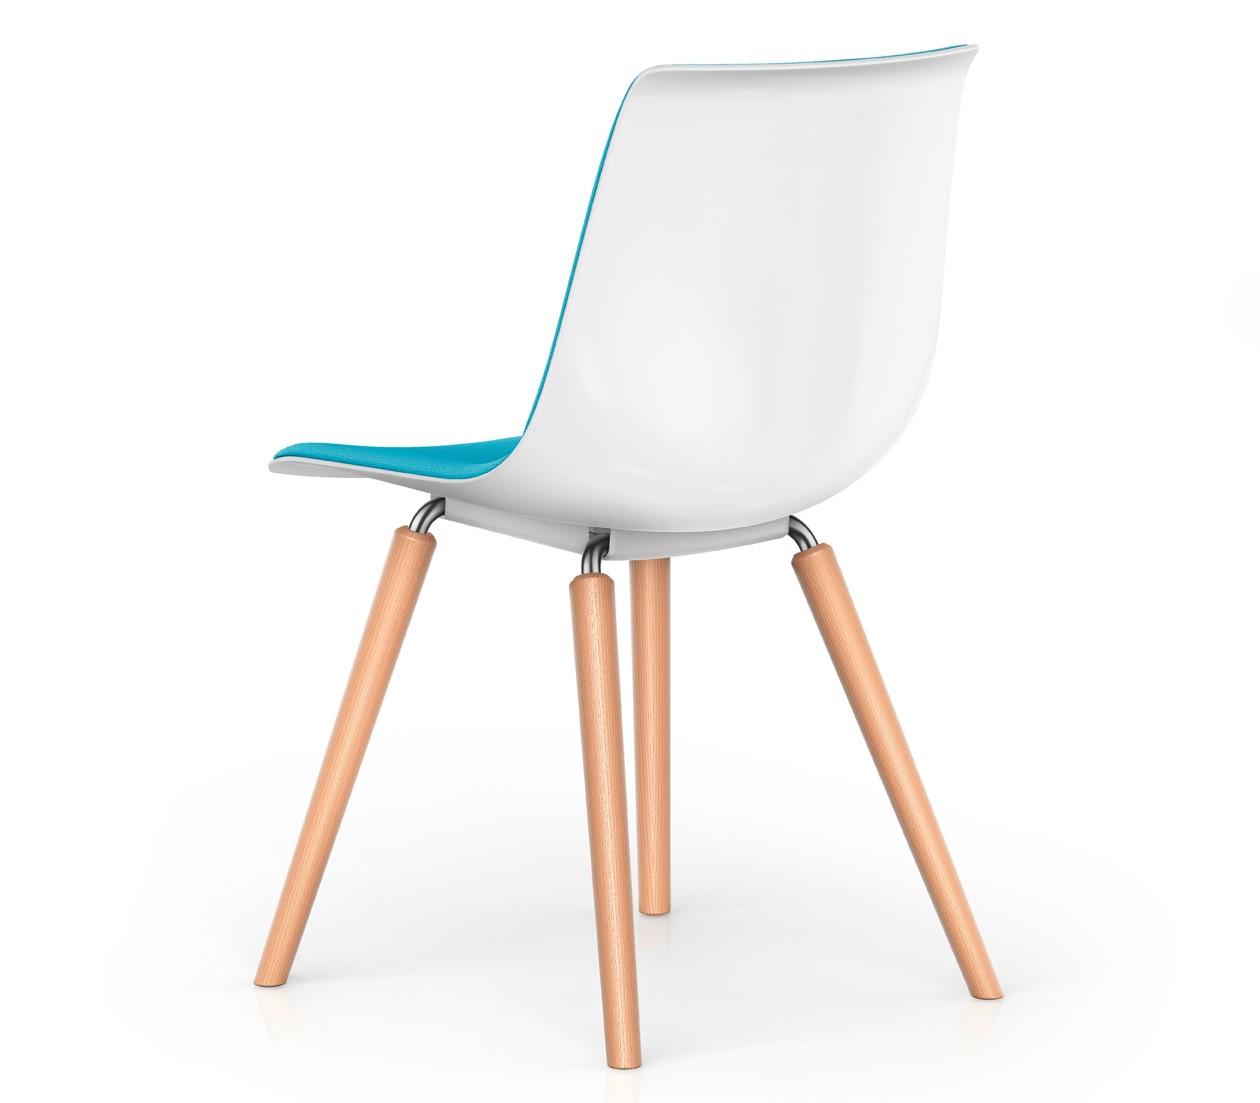 SHUFFLEis1 SU163 stoel